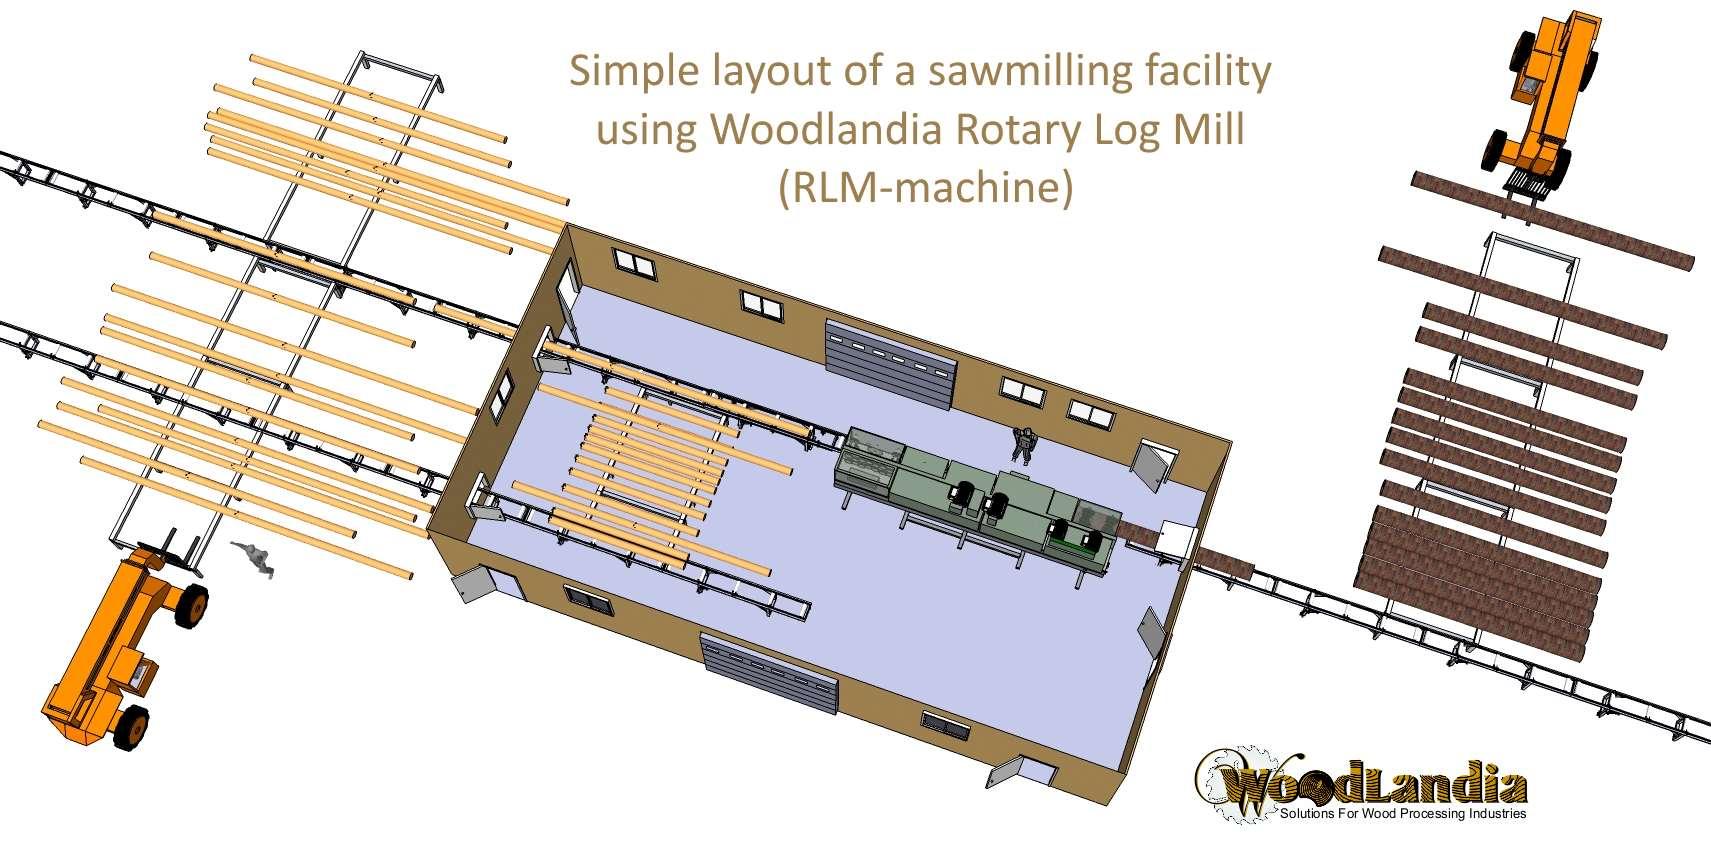 Simple RLM-layout